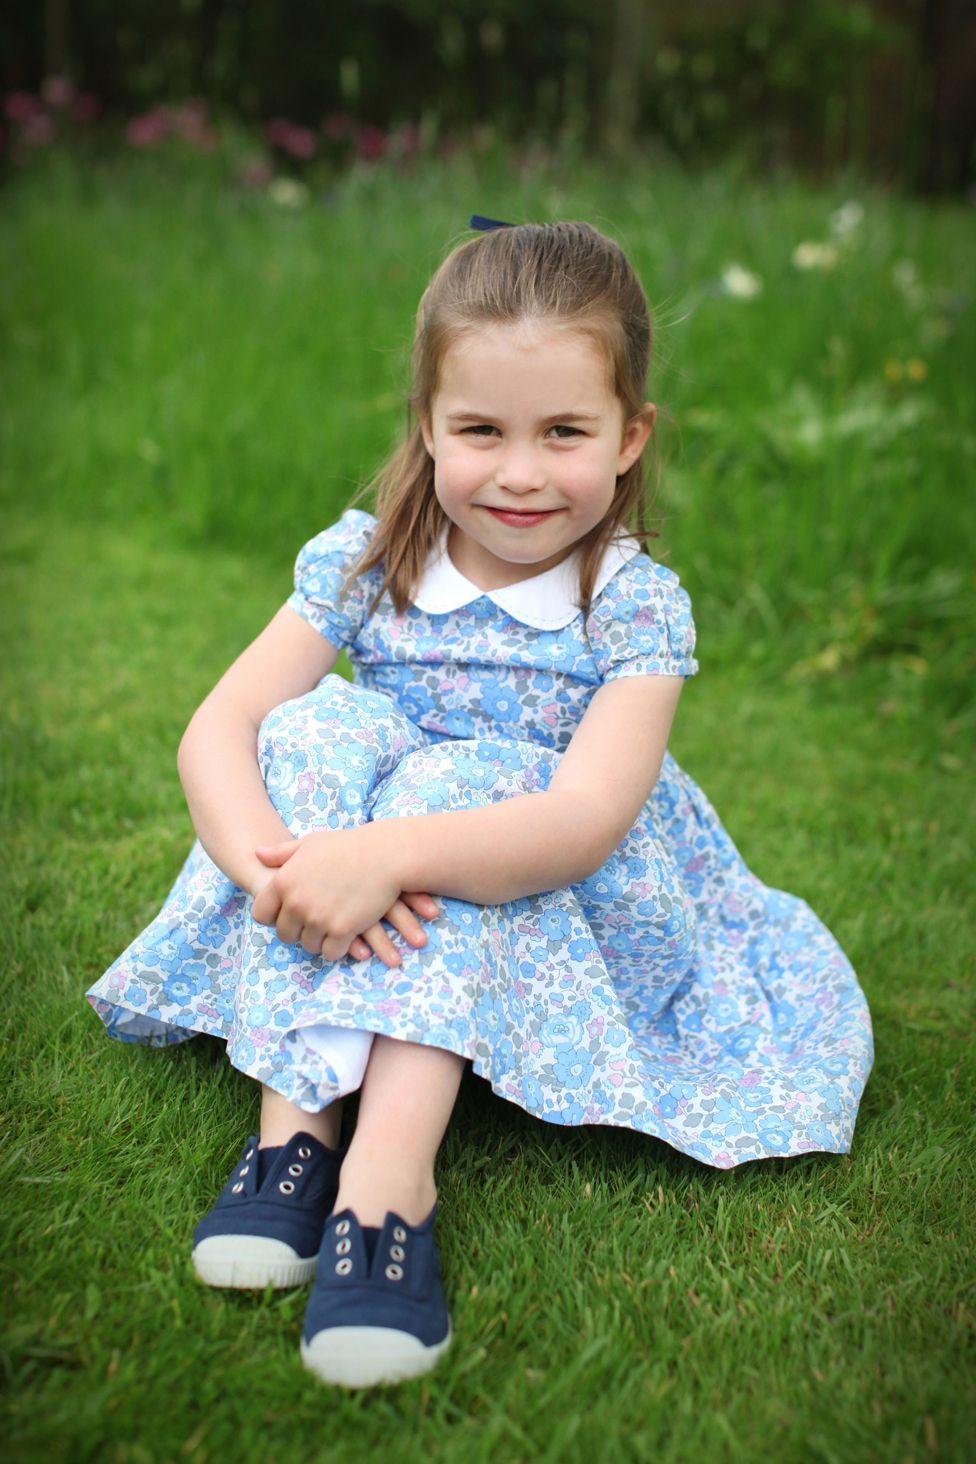 Princess Charlotte Photos Mark Fourth Birthday Bbc News